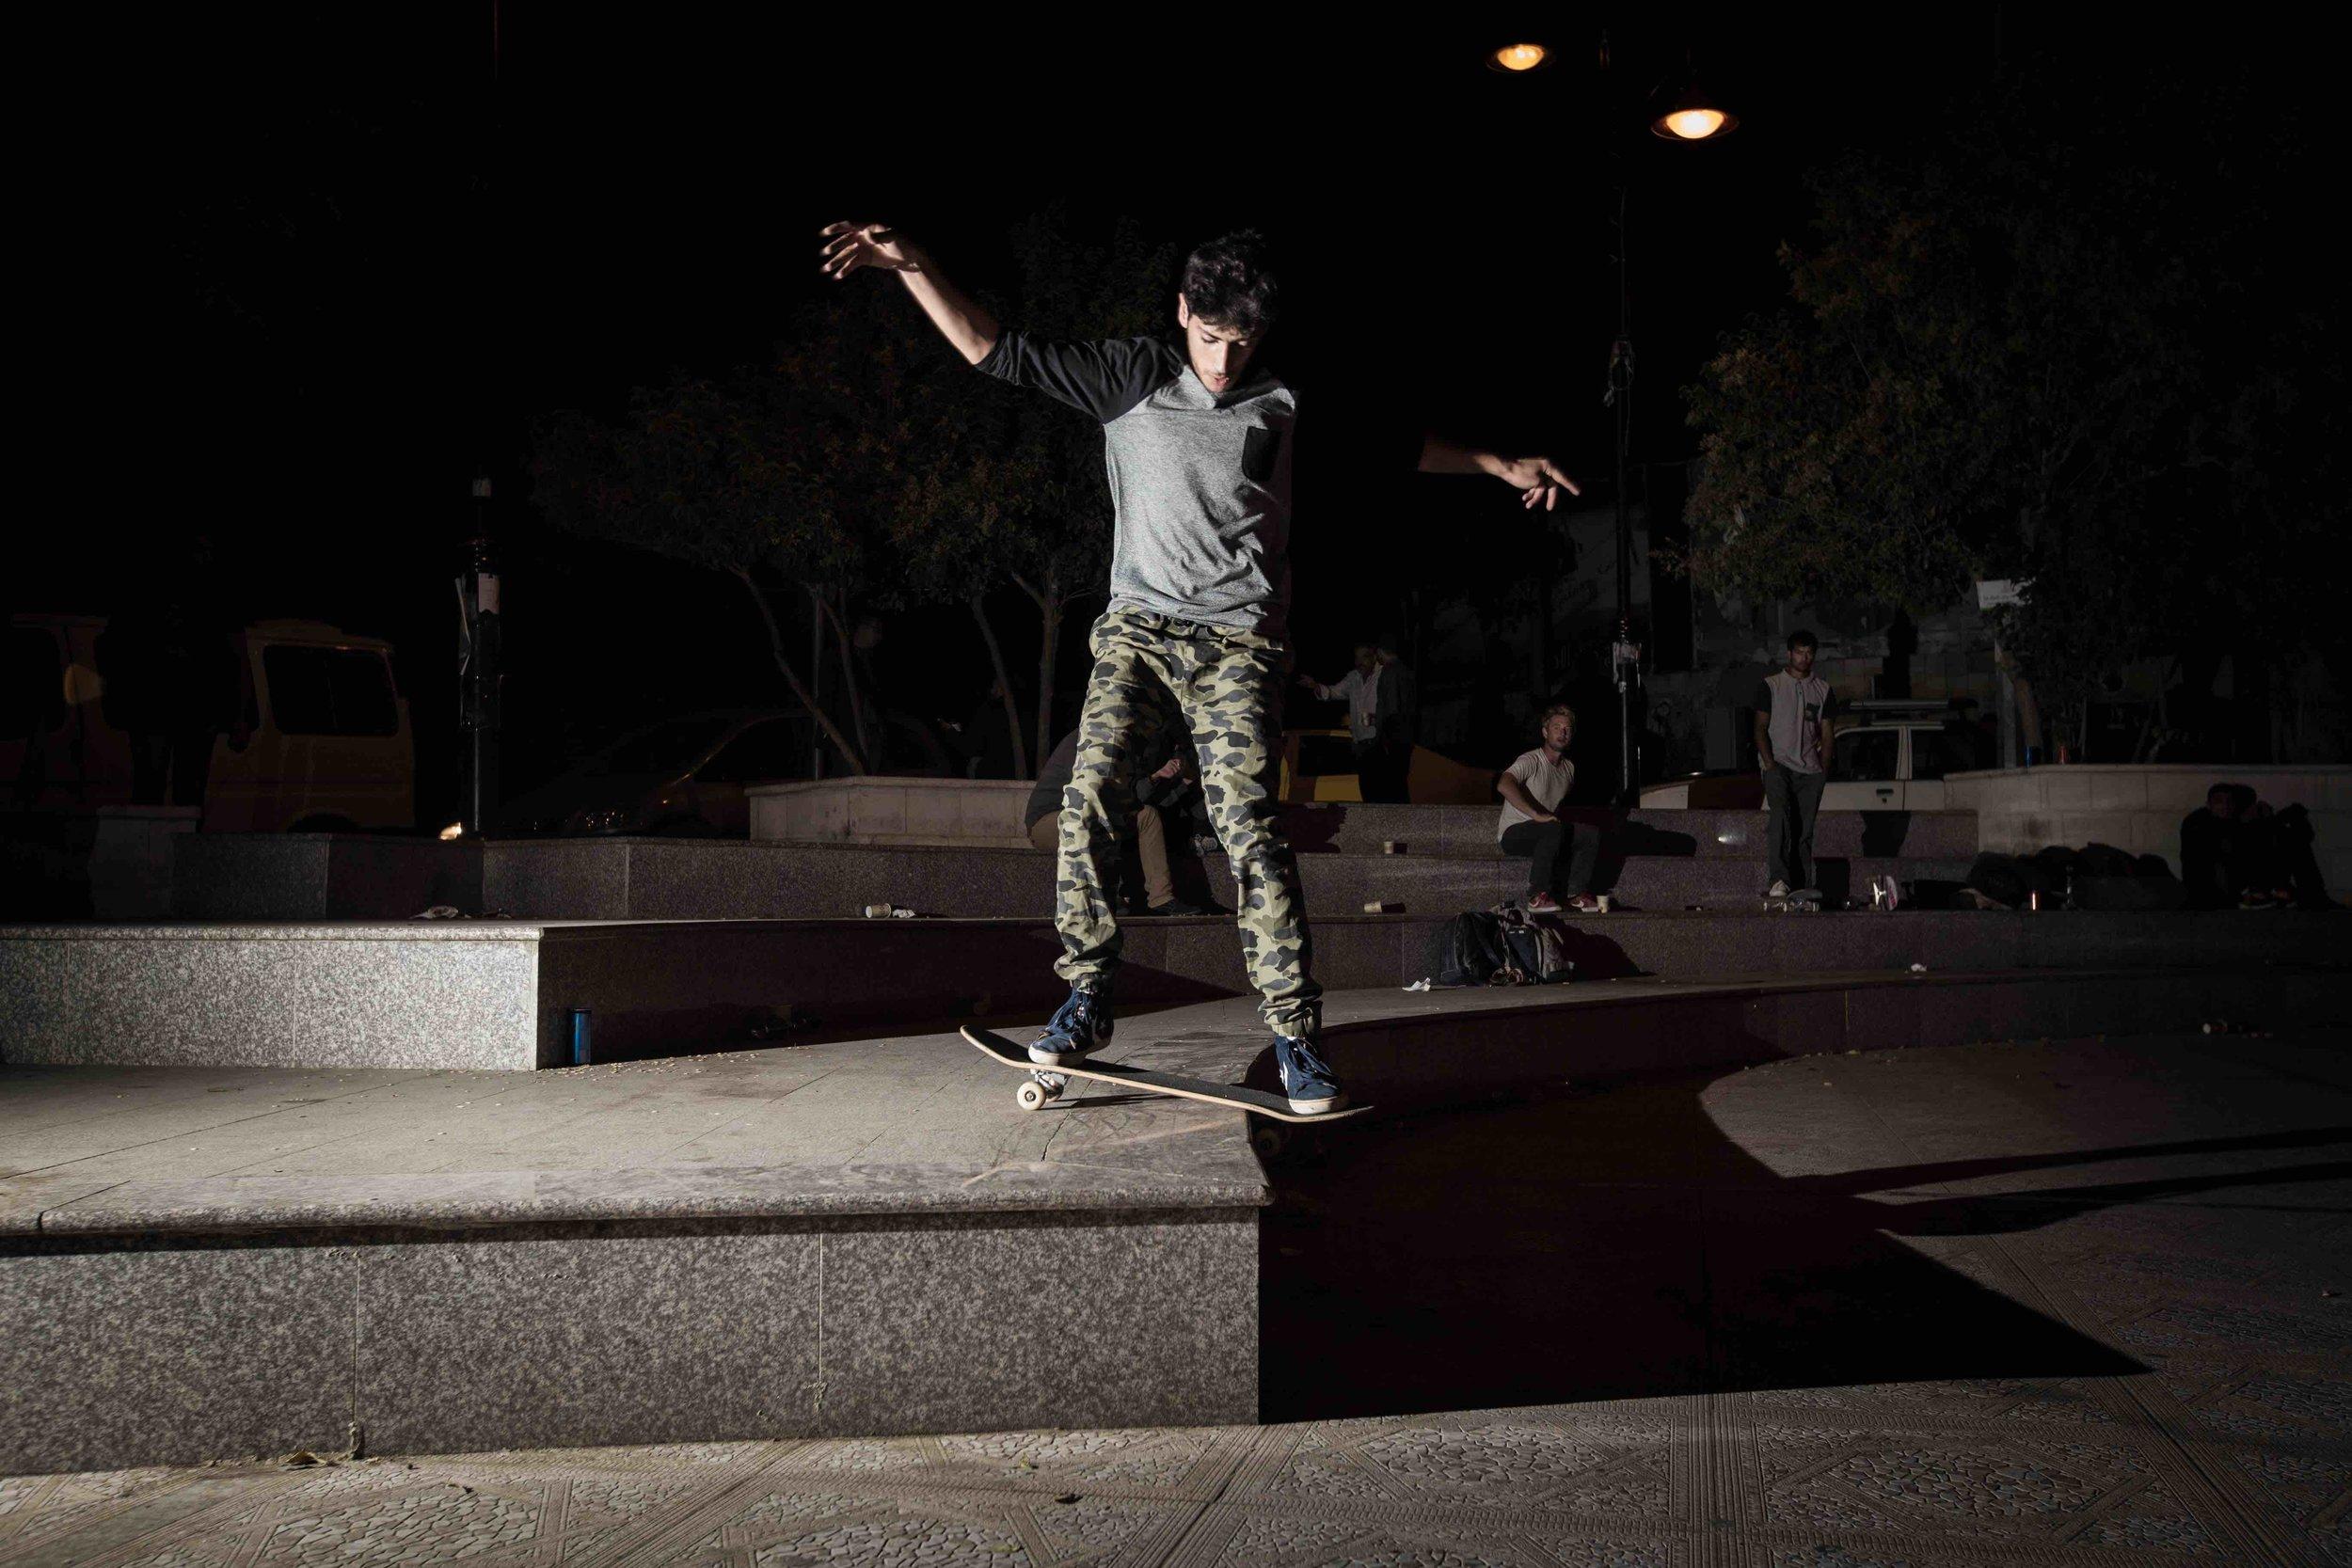 Aram Sabbah, Boardslide. Photo: Emil Agerskov